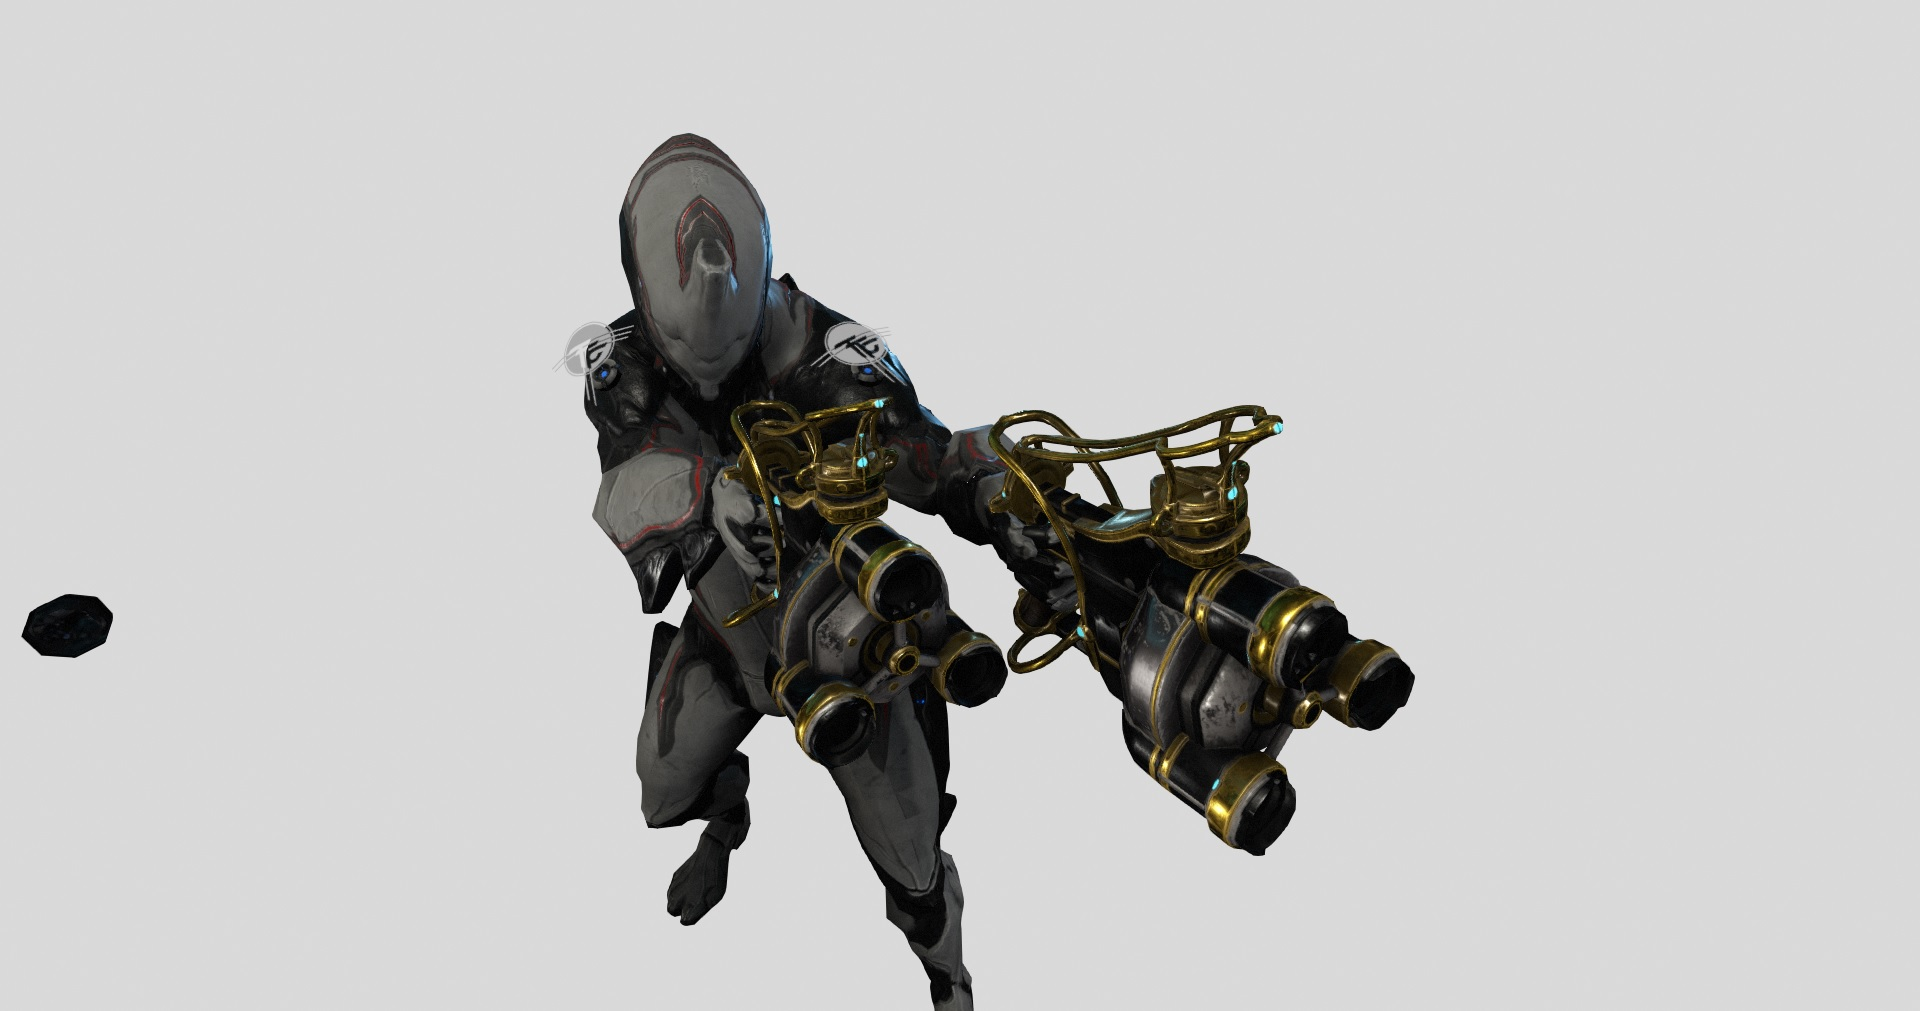 Secondary Weapons Akbronco Prime Todowarframe Nova prime wreaks devastation on her enemies using volatile antimatter. secondary weapons akbronco prime